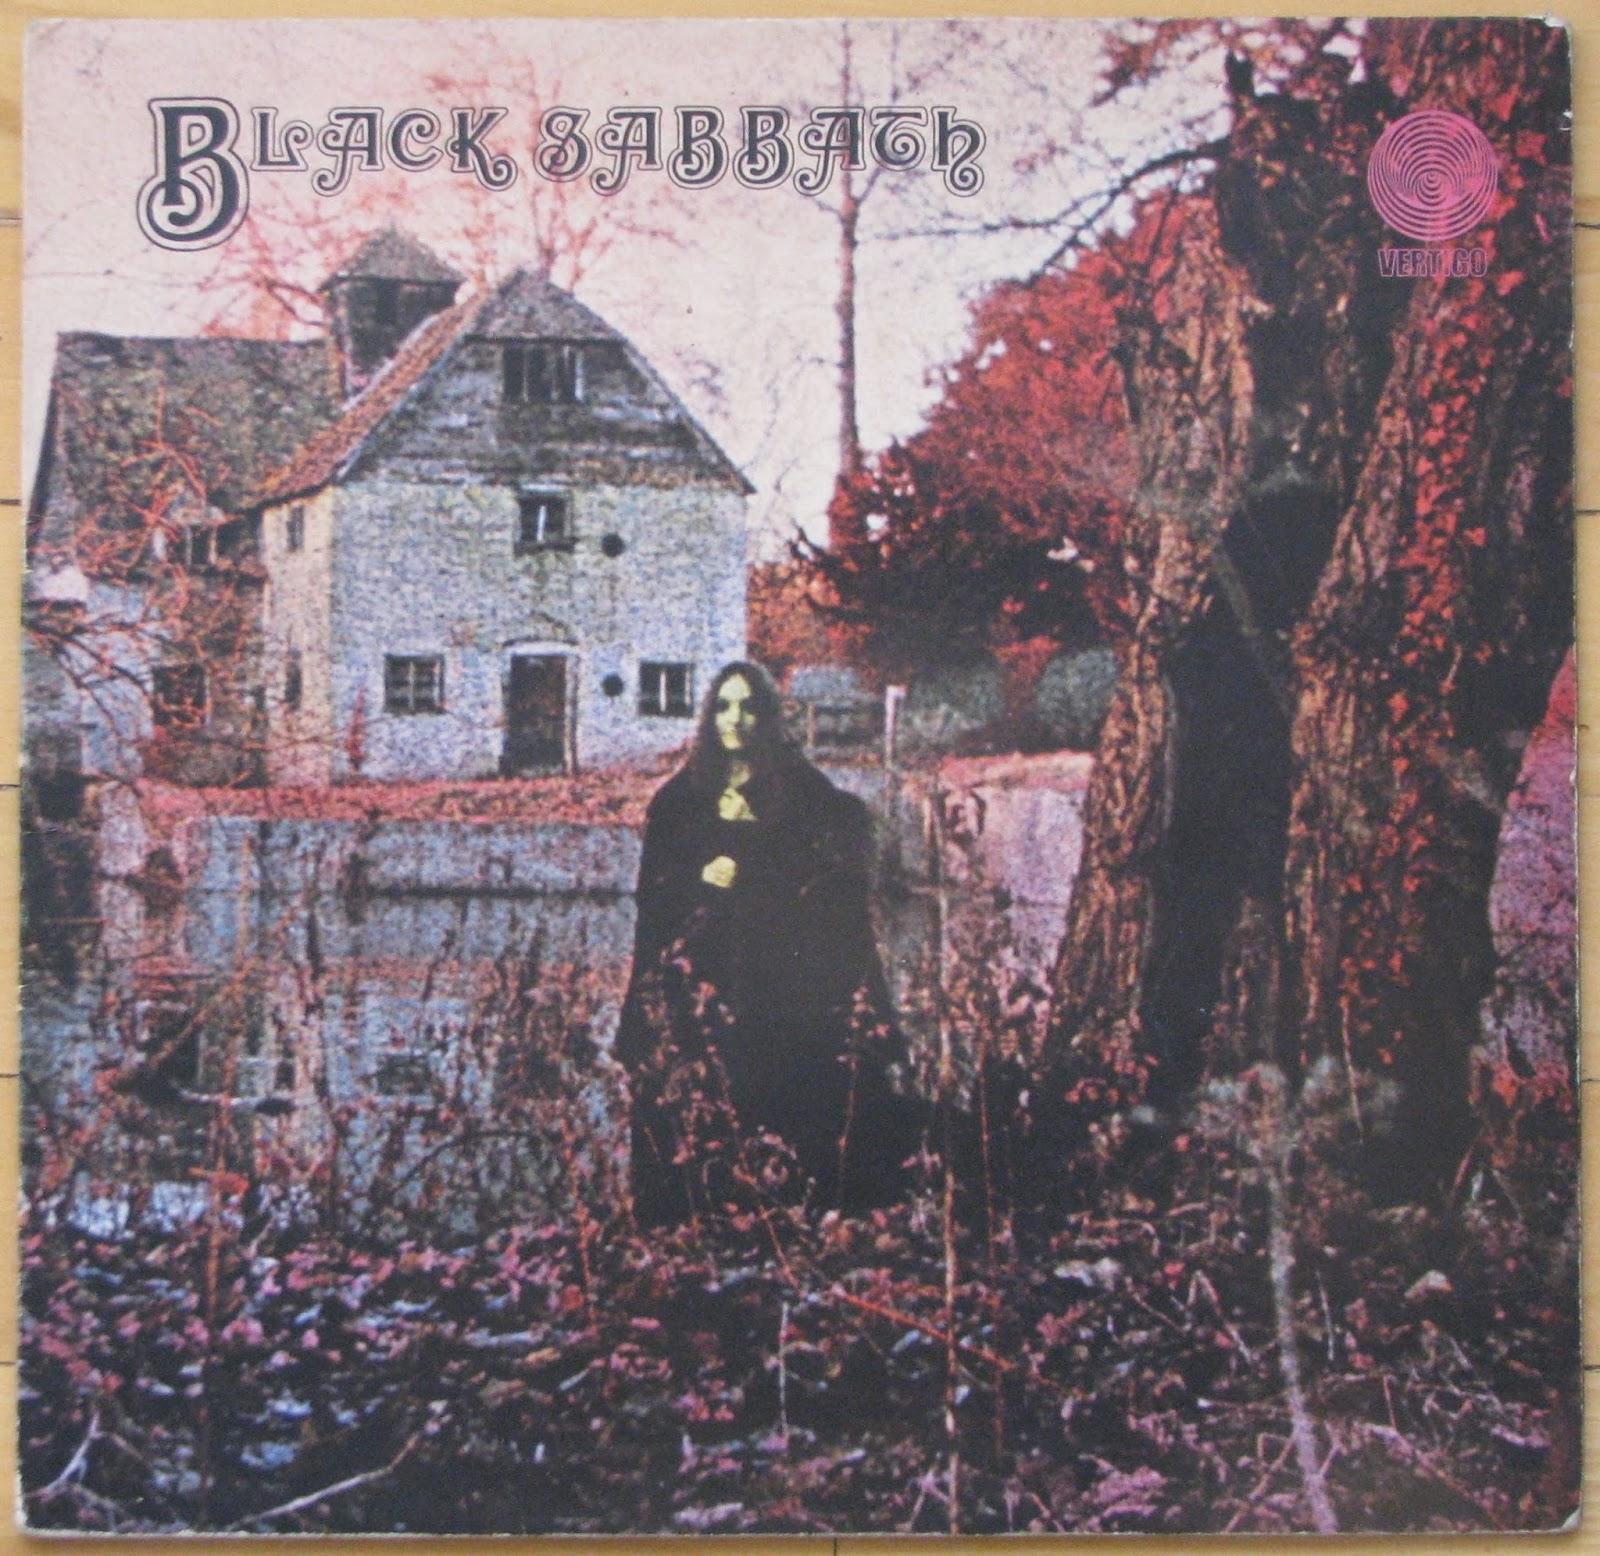 We Will Bury You Black Sabbath The Original Six